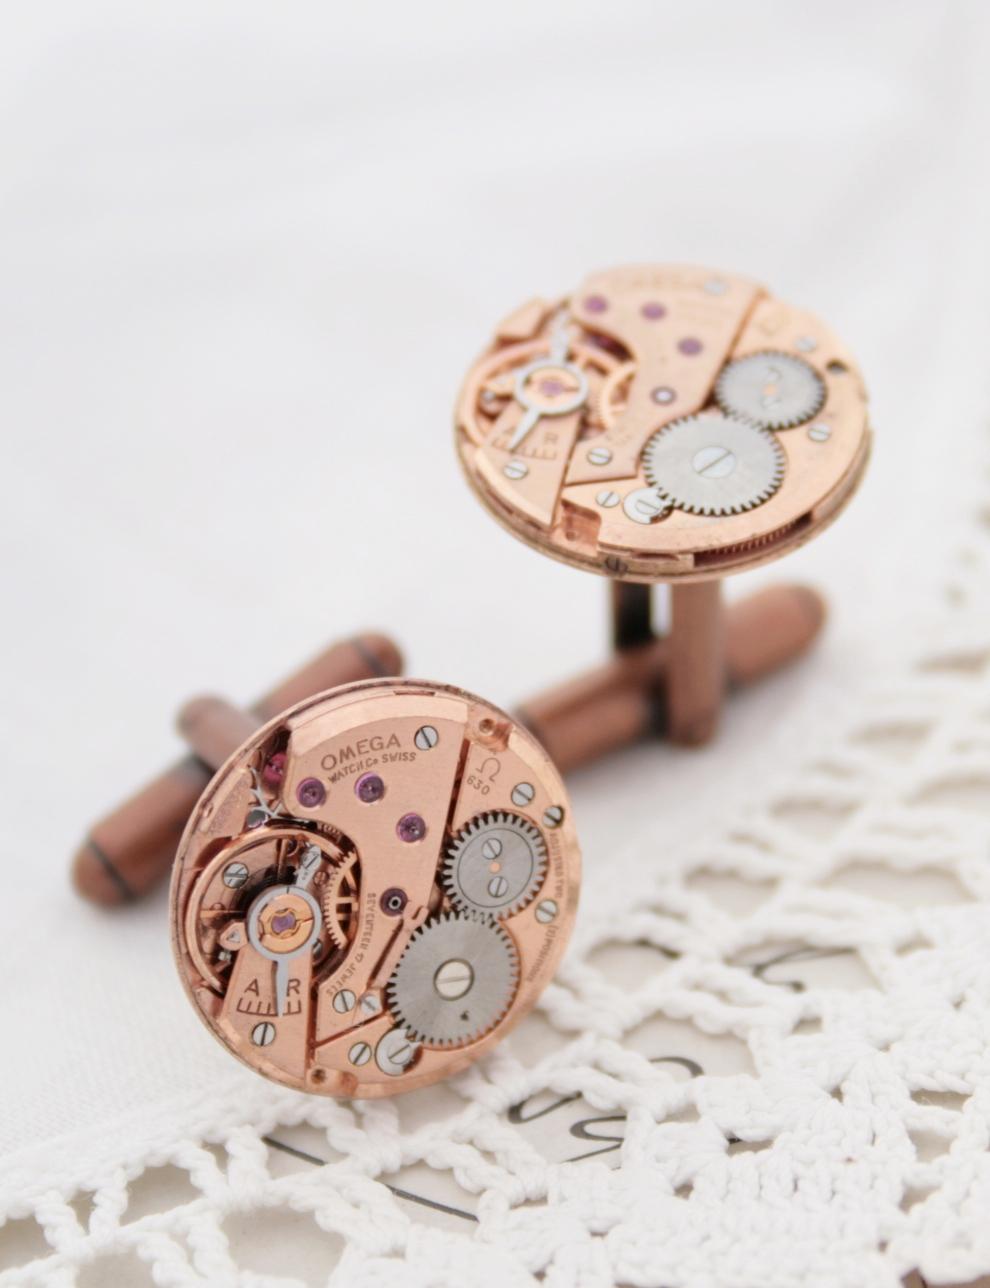 Omega cufflinks rose gold